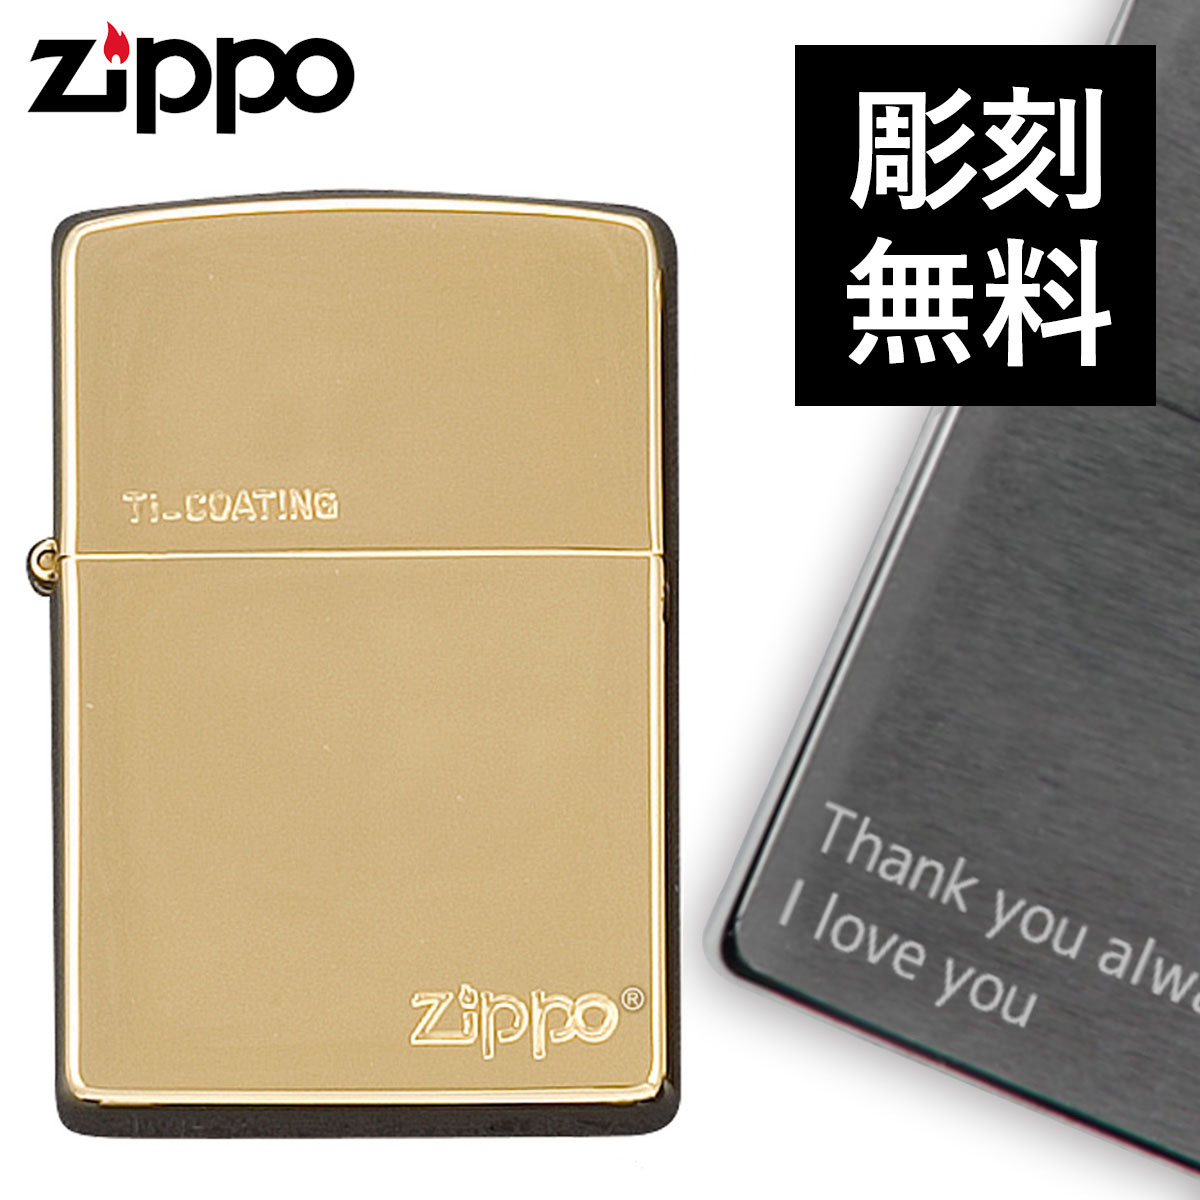 zippo 名入れ ジッポー ライター チタン キズがつきにくい 金チタン A オイルライター ジッポライター ギフト プレゼント 彼氏 男性 メンズ